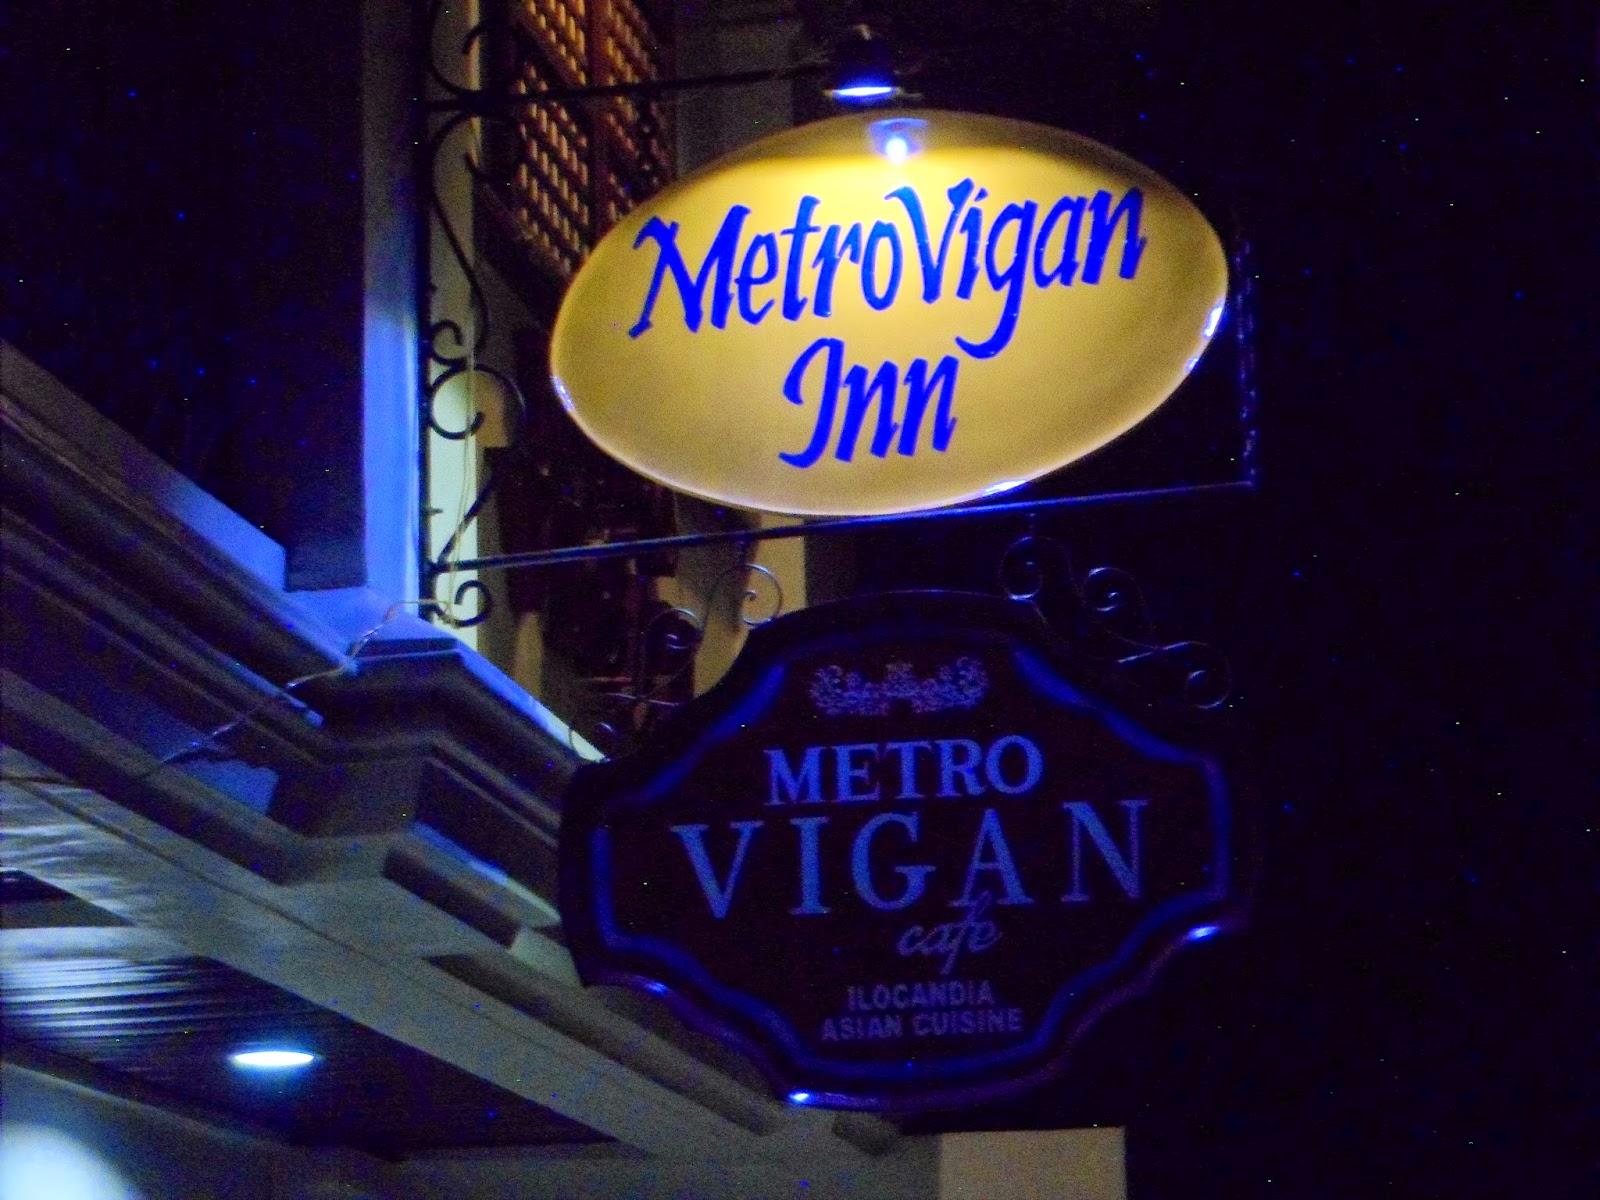 Metro Vigan Inn: A Budget Friendly Hotel With Ilocano Hospitality